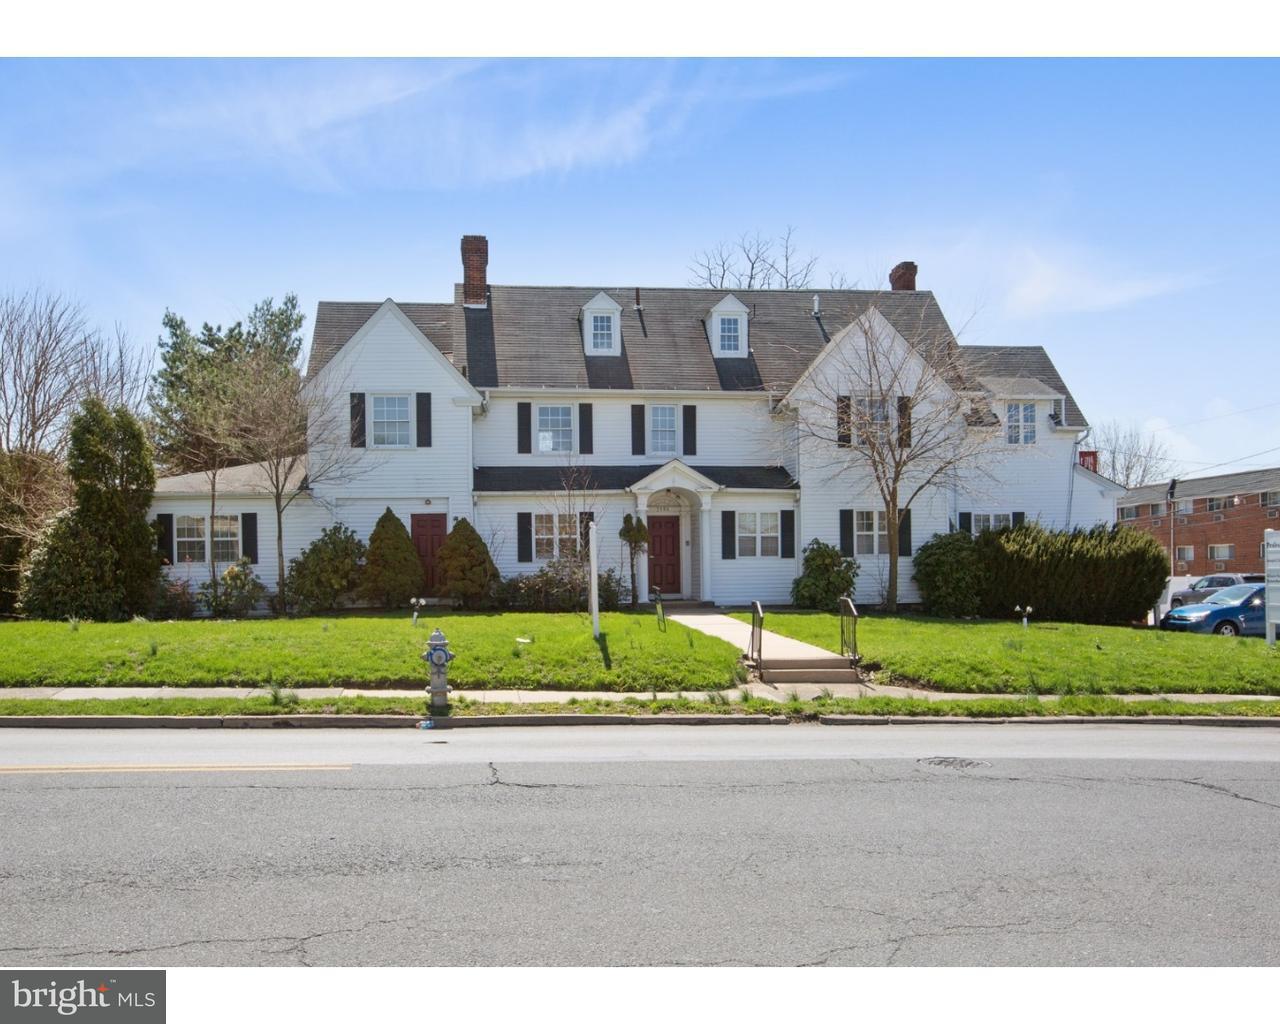 Single Family Home for Sale at 3400 GARRETT Road Drexel Hill, Pennsylvania 19026 United States